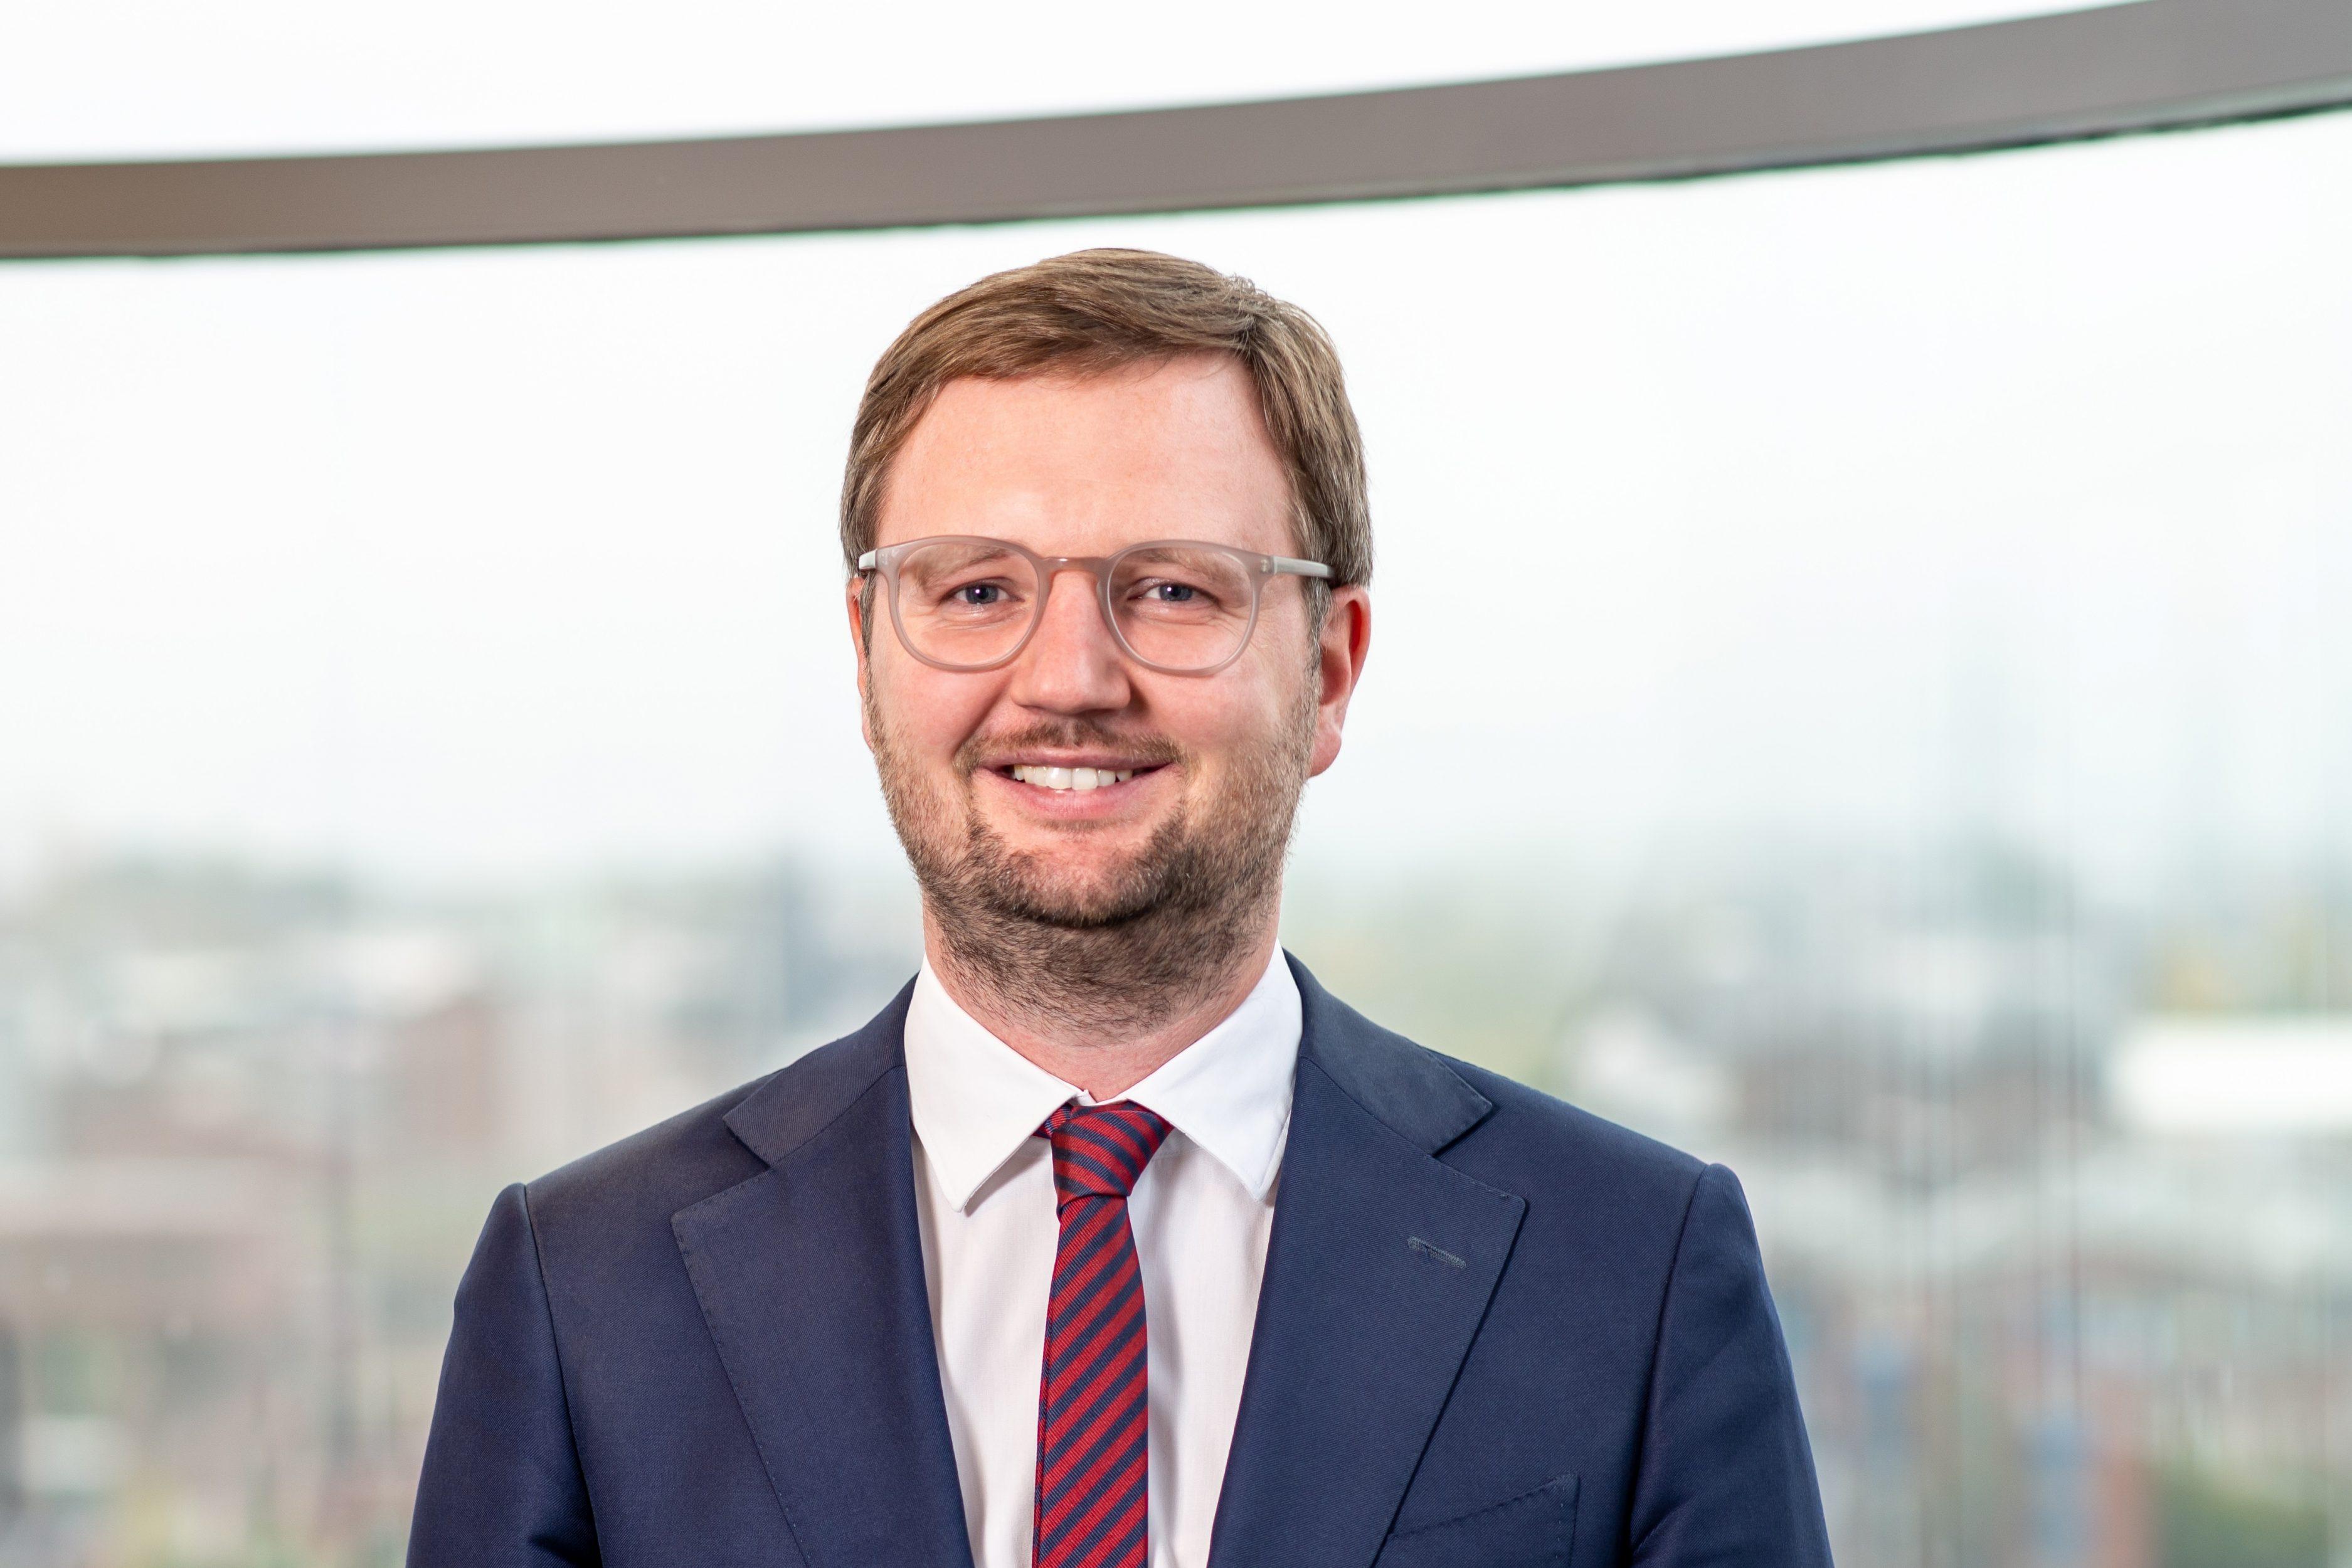 Notar Dr. Christoph Fischer